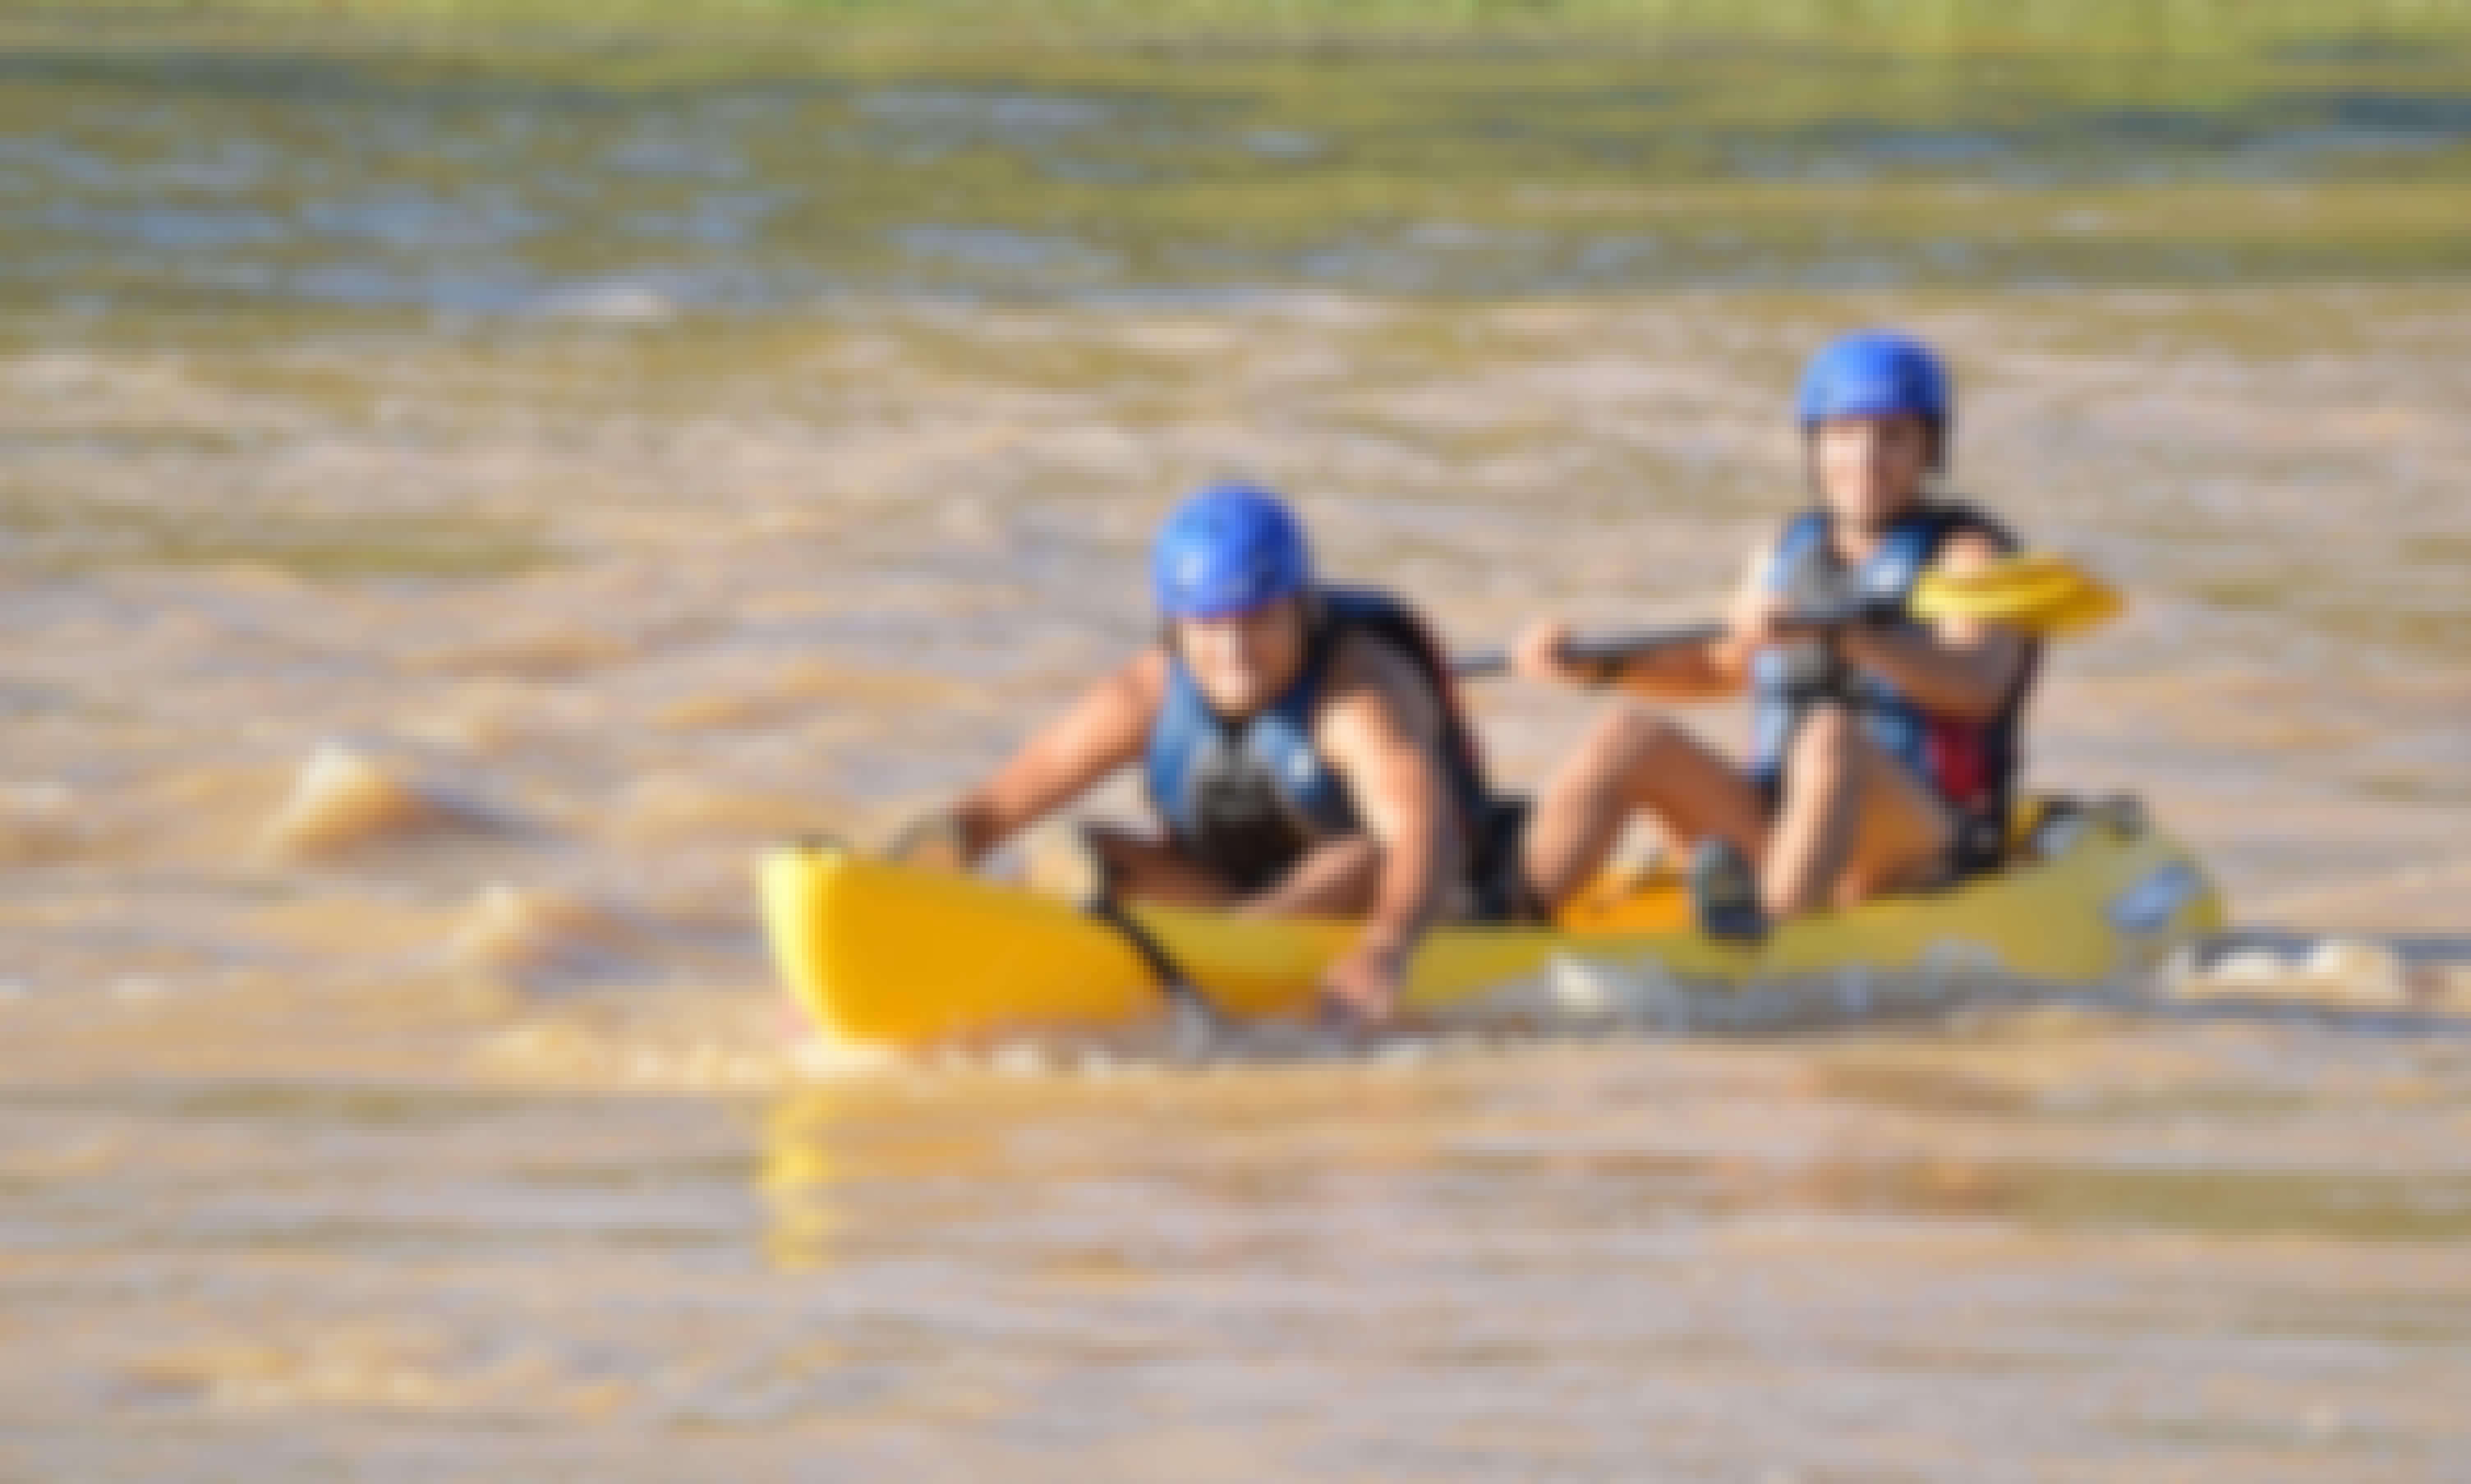 Kayaking Descending Trips & Lessons in Fraga